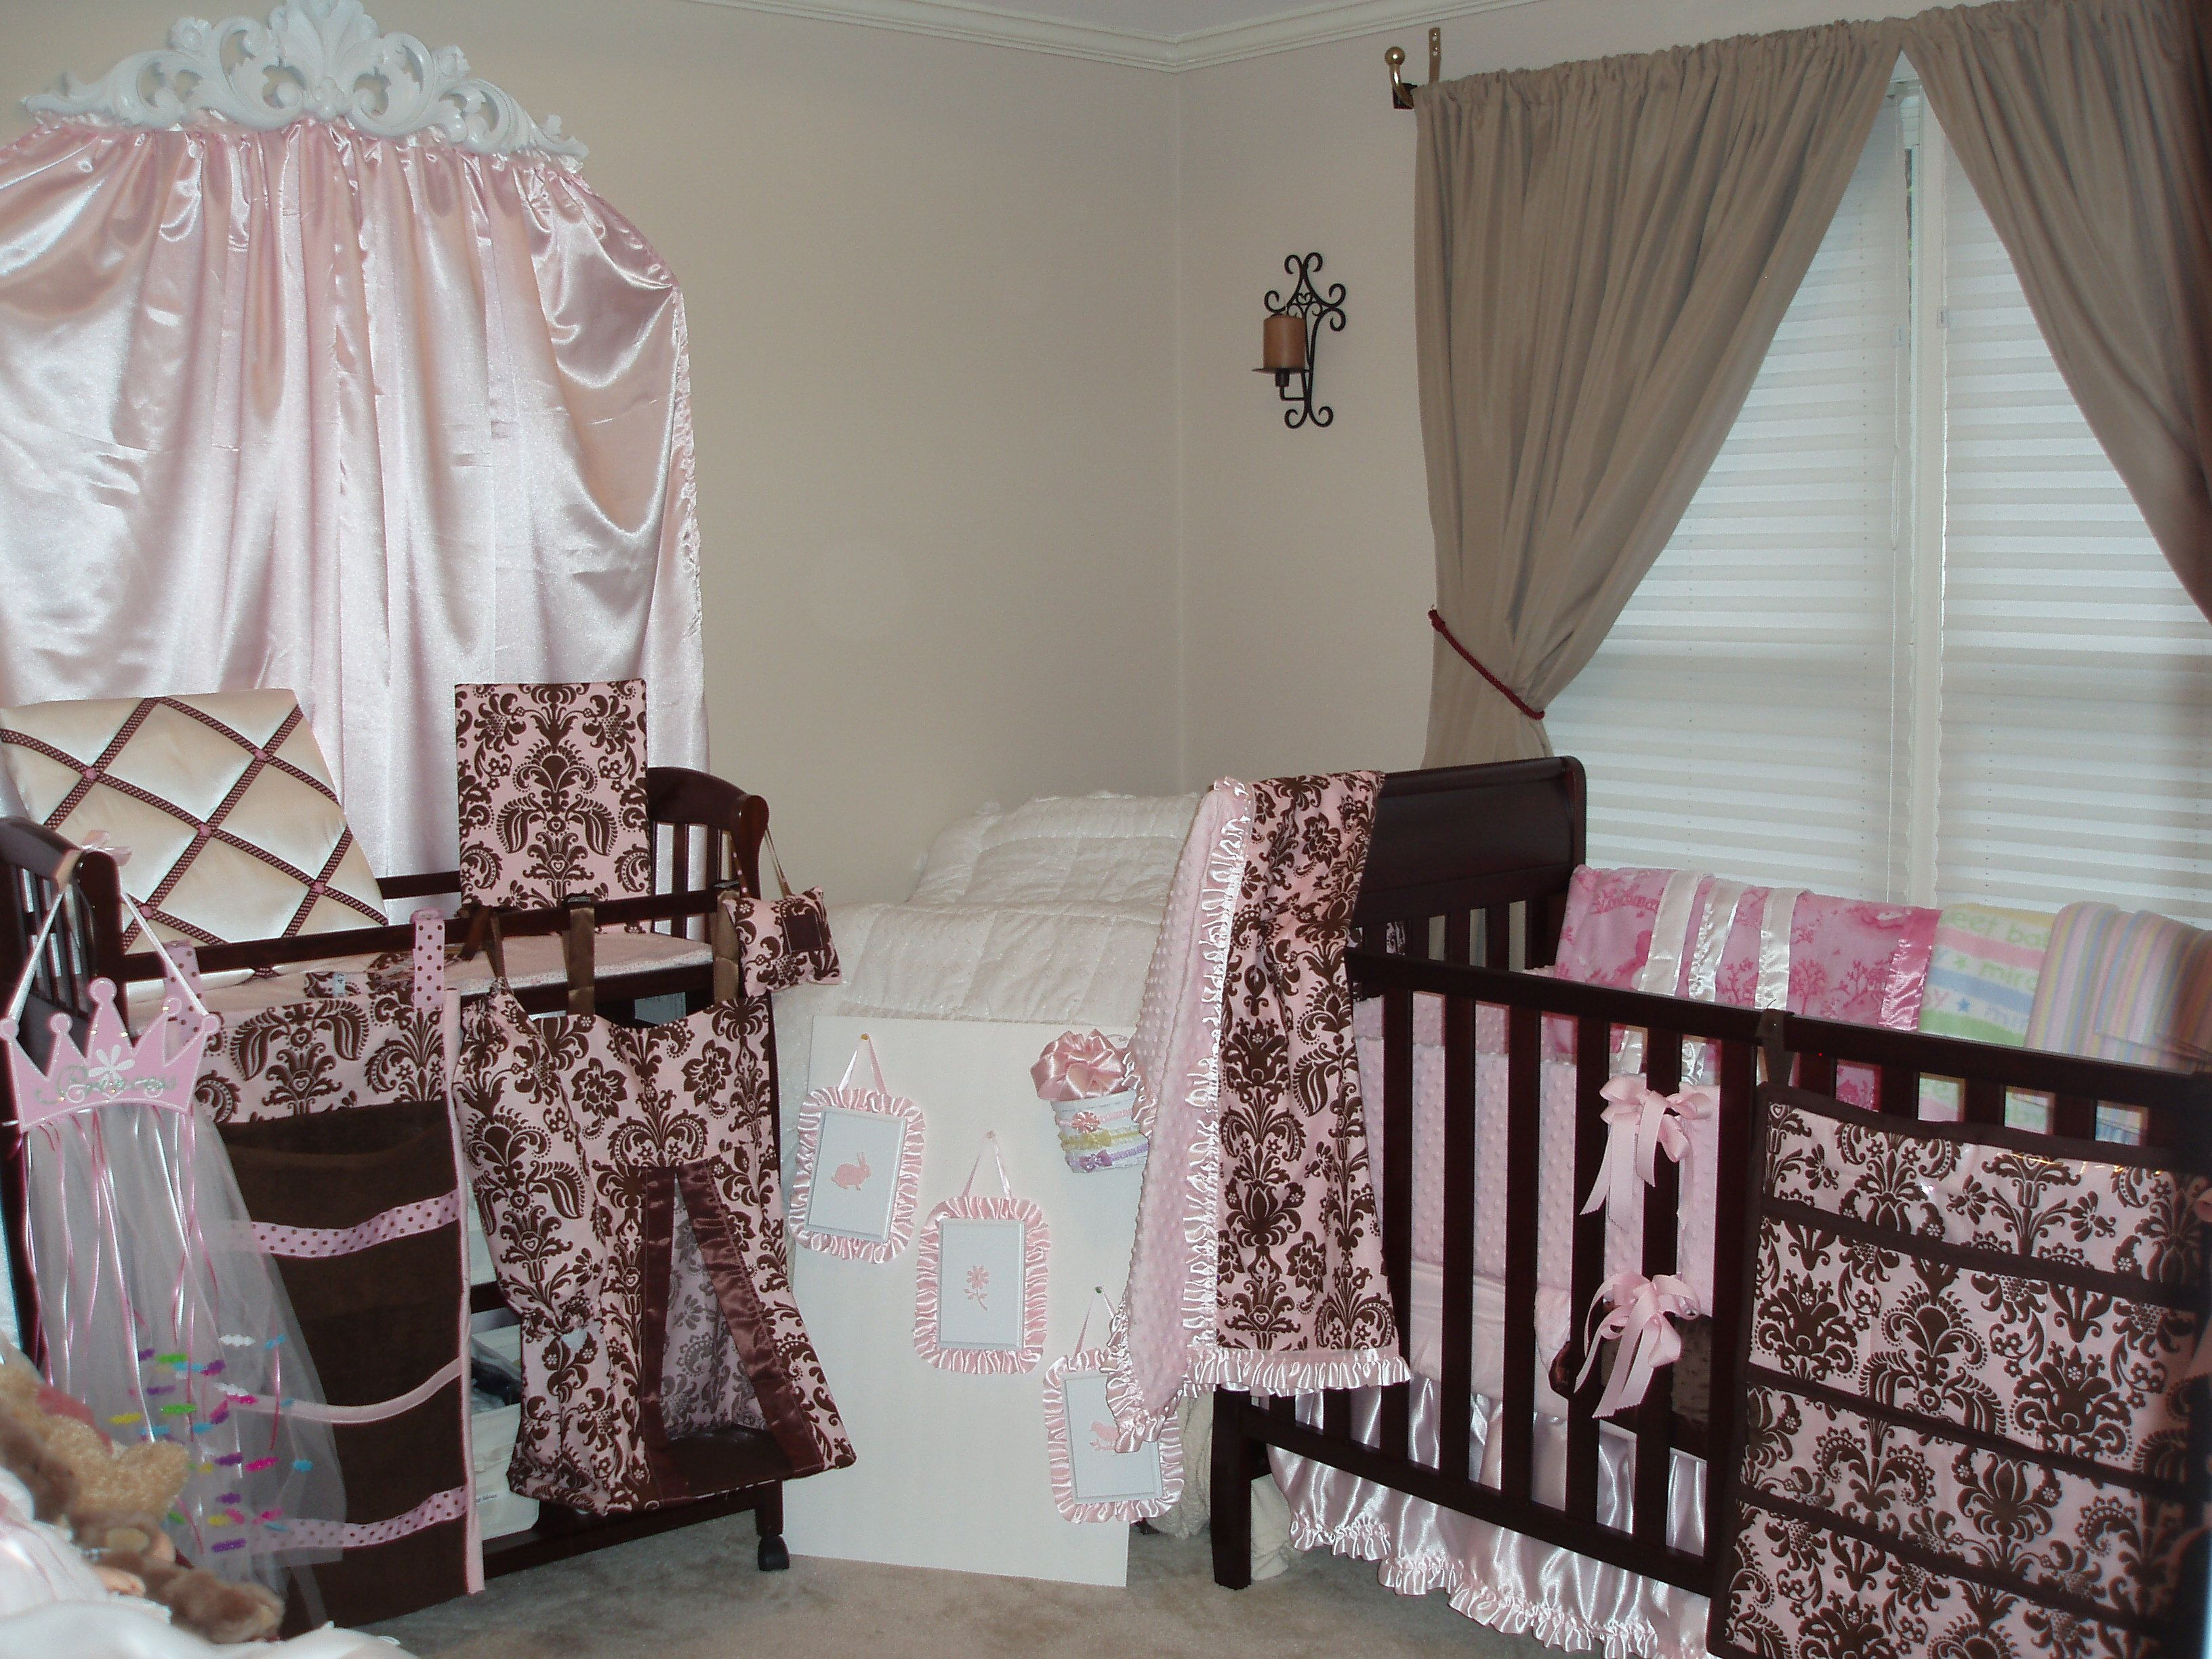 Simply Elegant Baby Bedding Baby bed, Elegant baby, Home